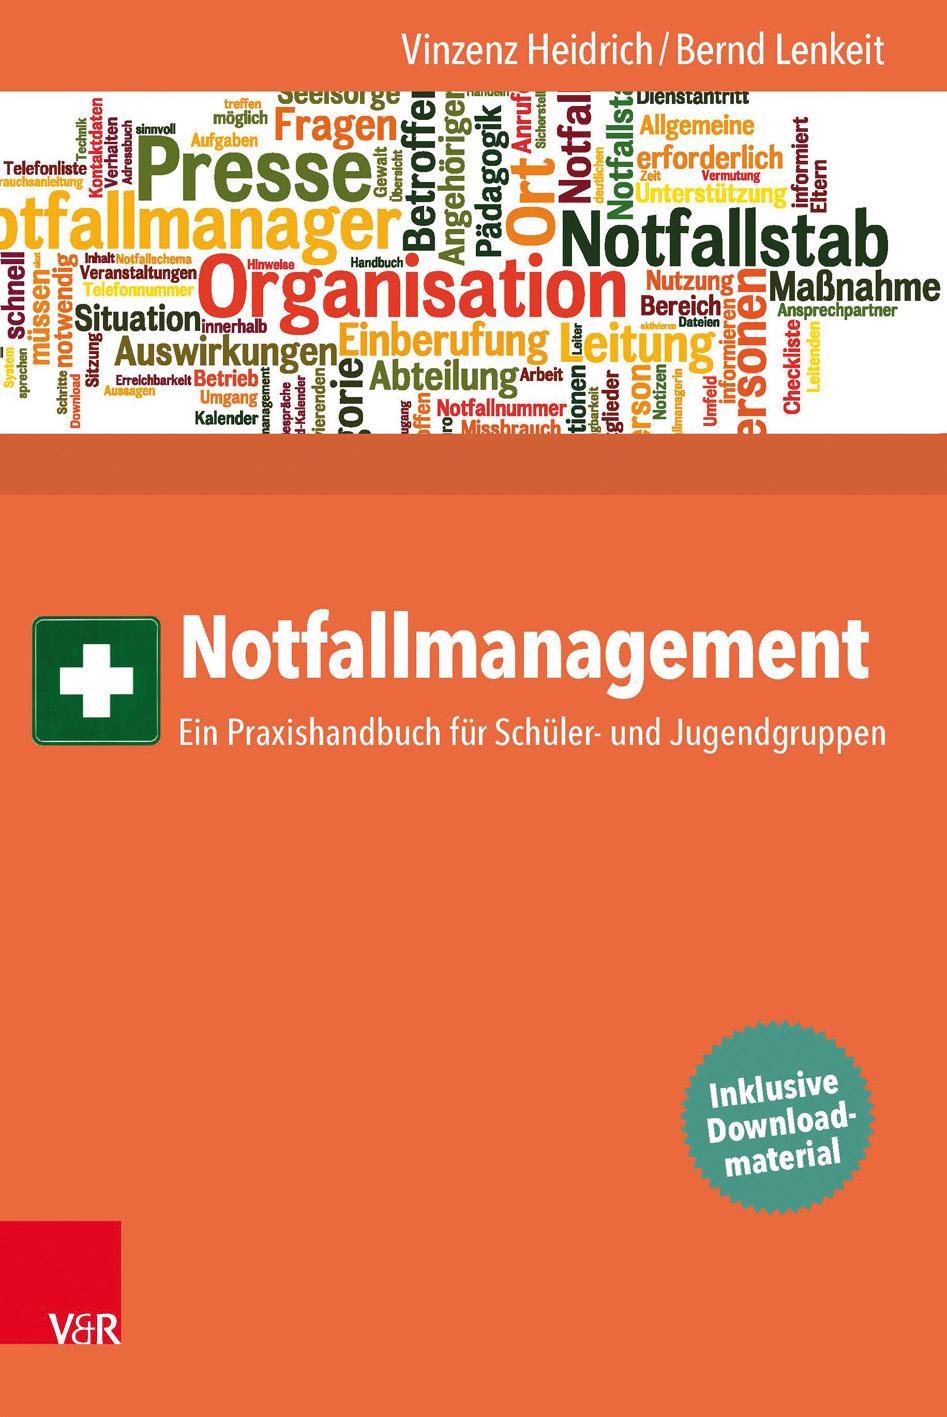 Notfallmanagement - Vinzenz Heidrich -  9783525701768